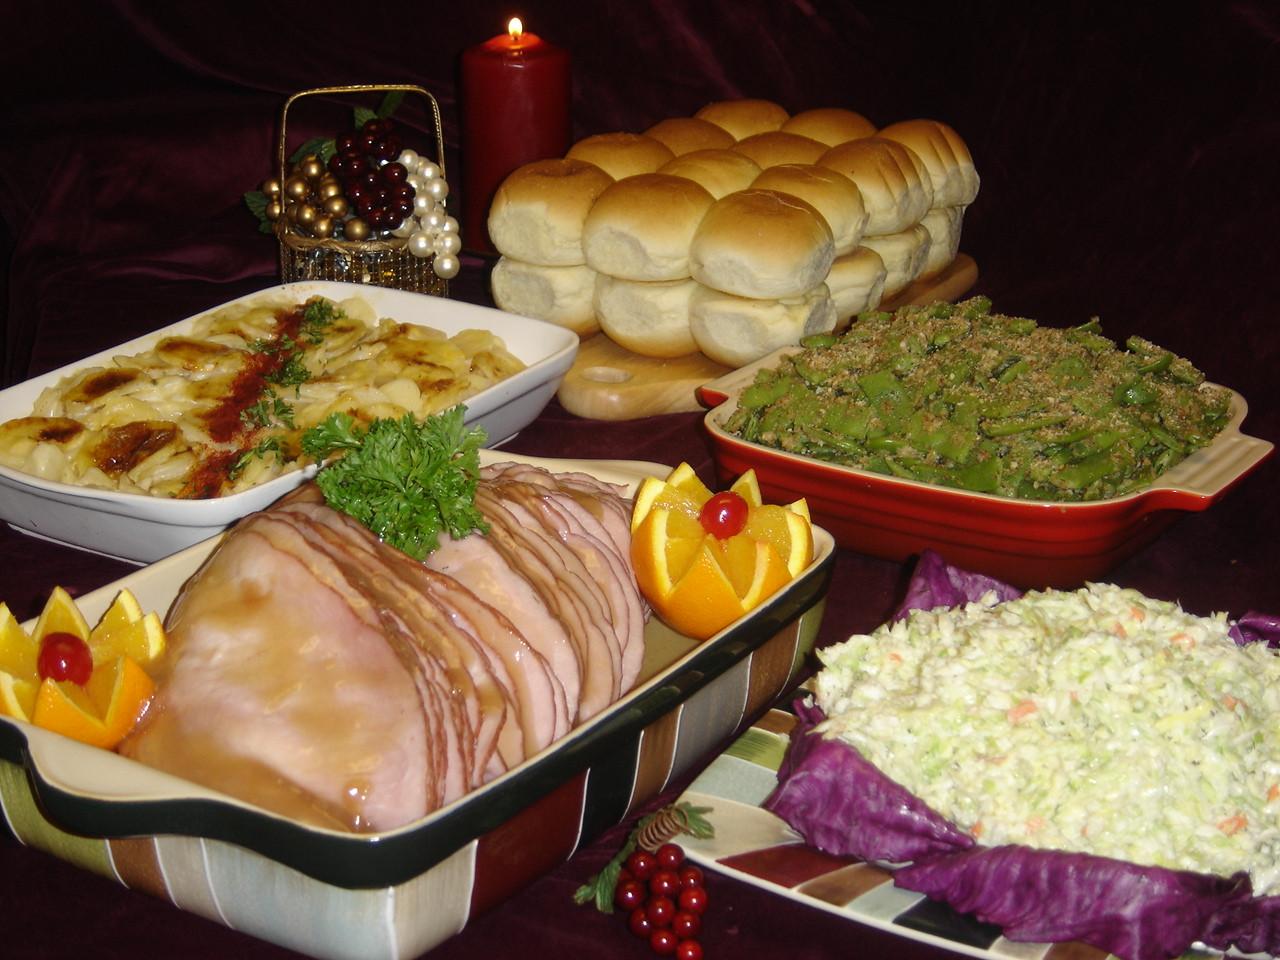 Easter Ham Menu  Hop into Schiff's for Easter Dinner made easy